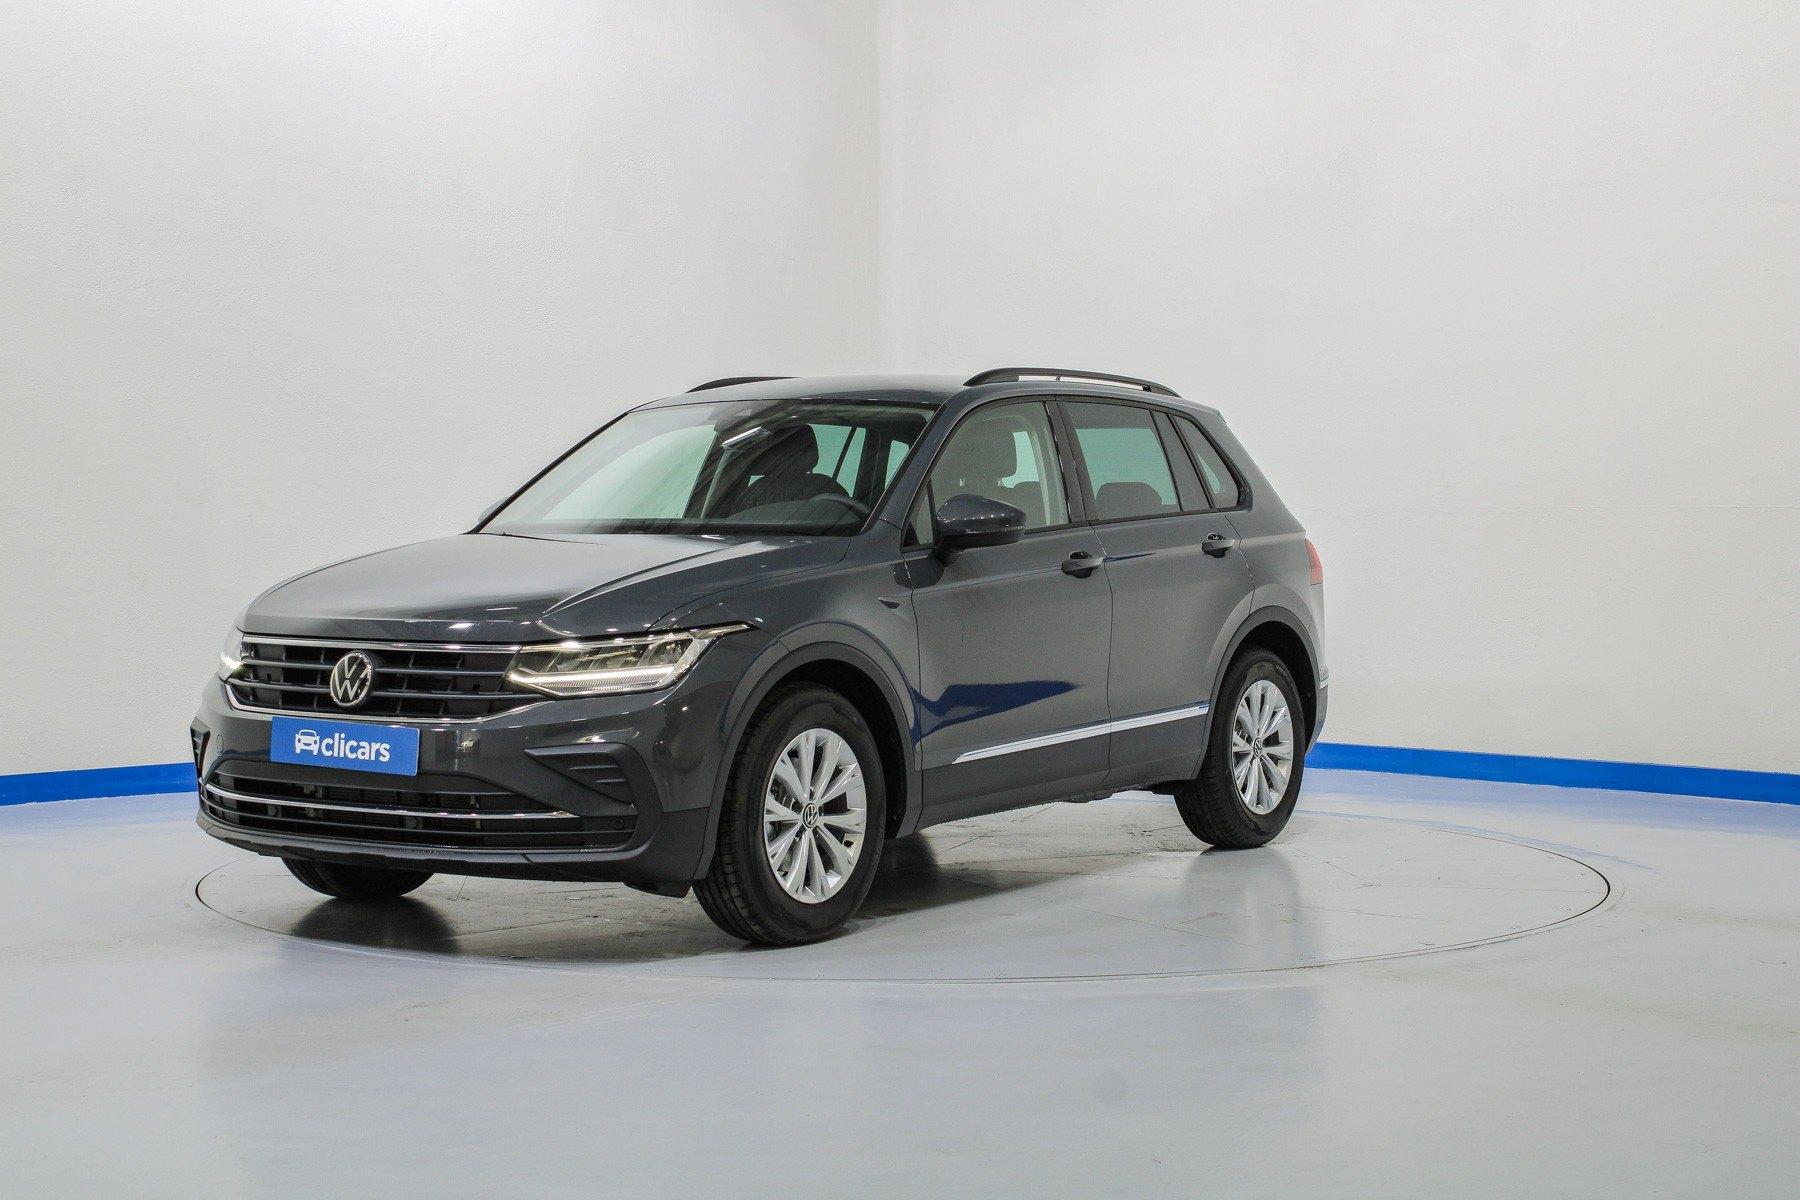 Volkswagen Tiguan Gasolina Life 1.5 TSI 110kW (150CV) DSG 1